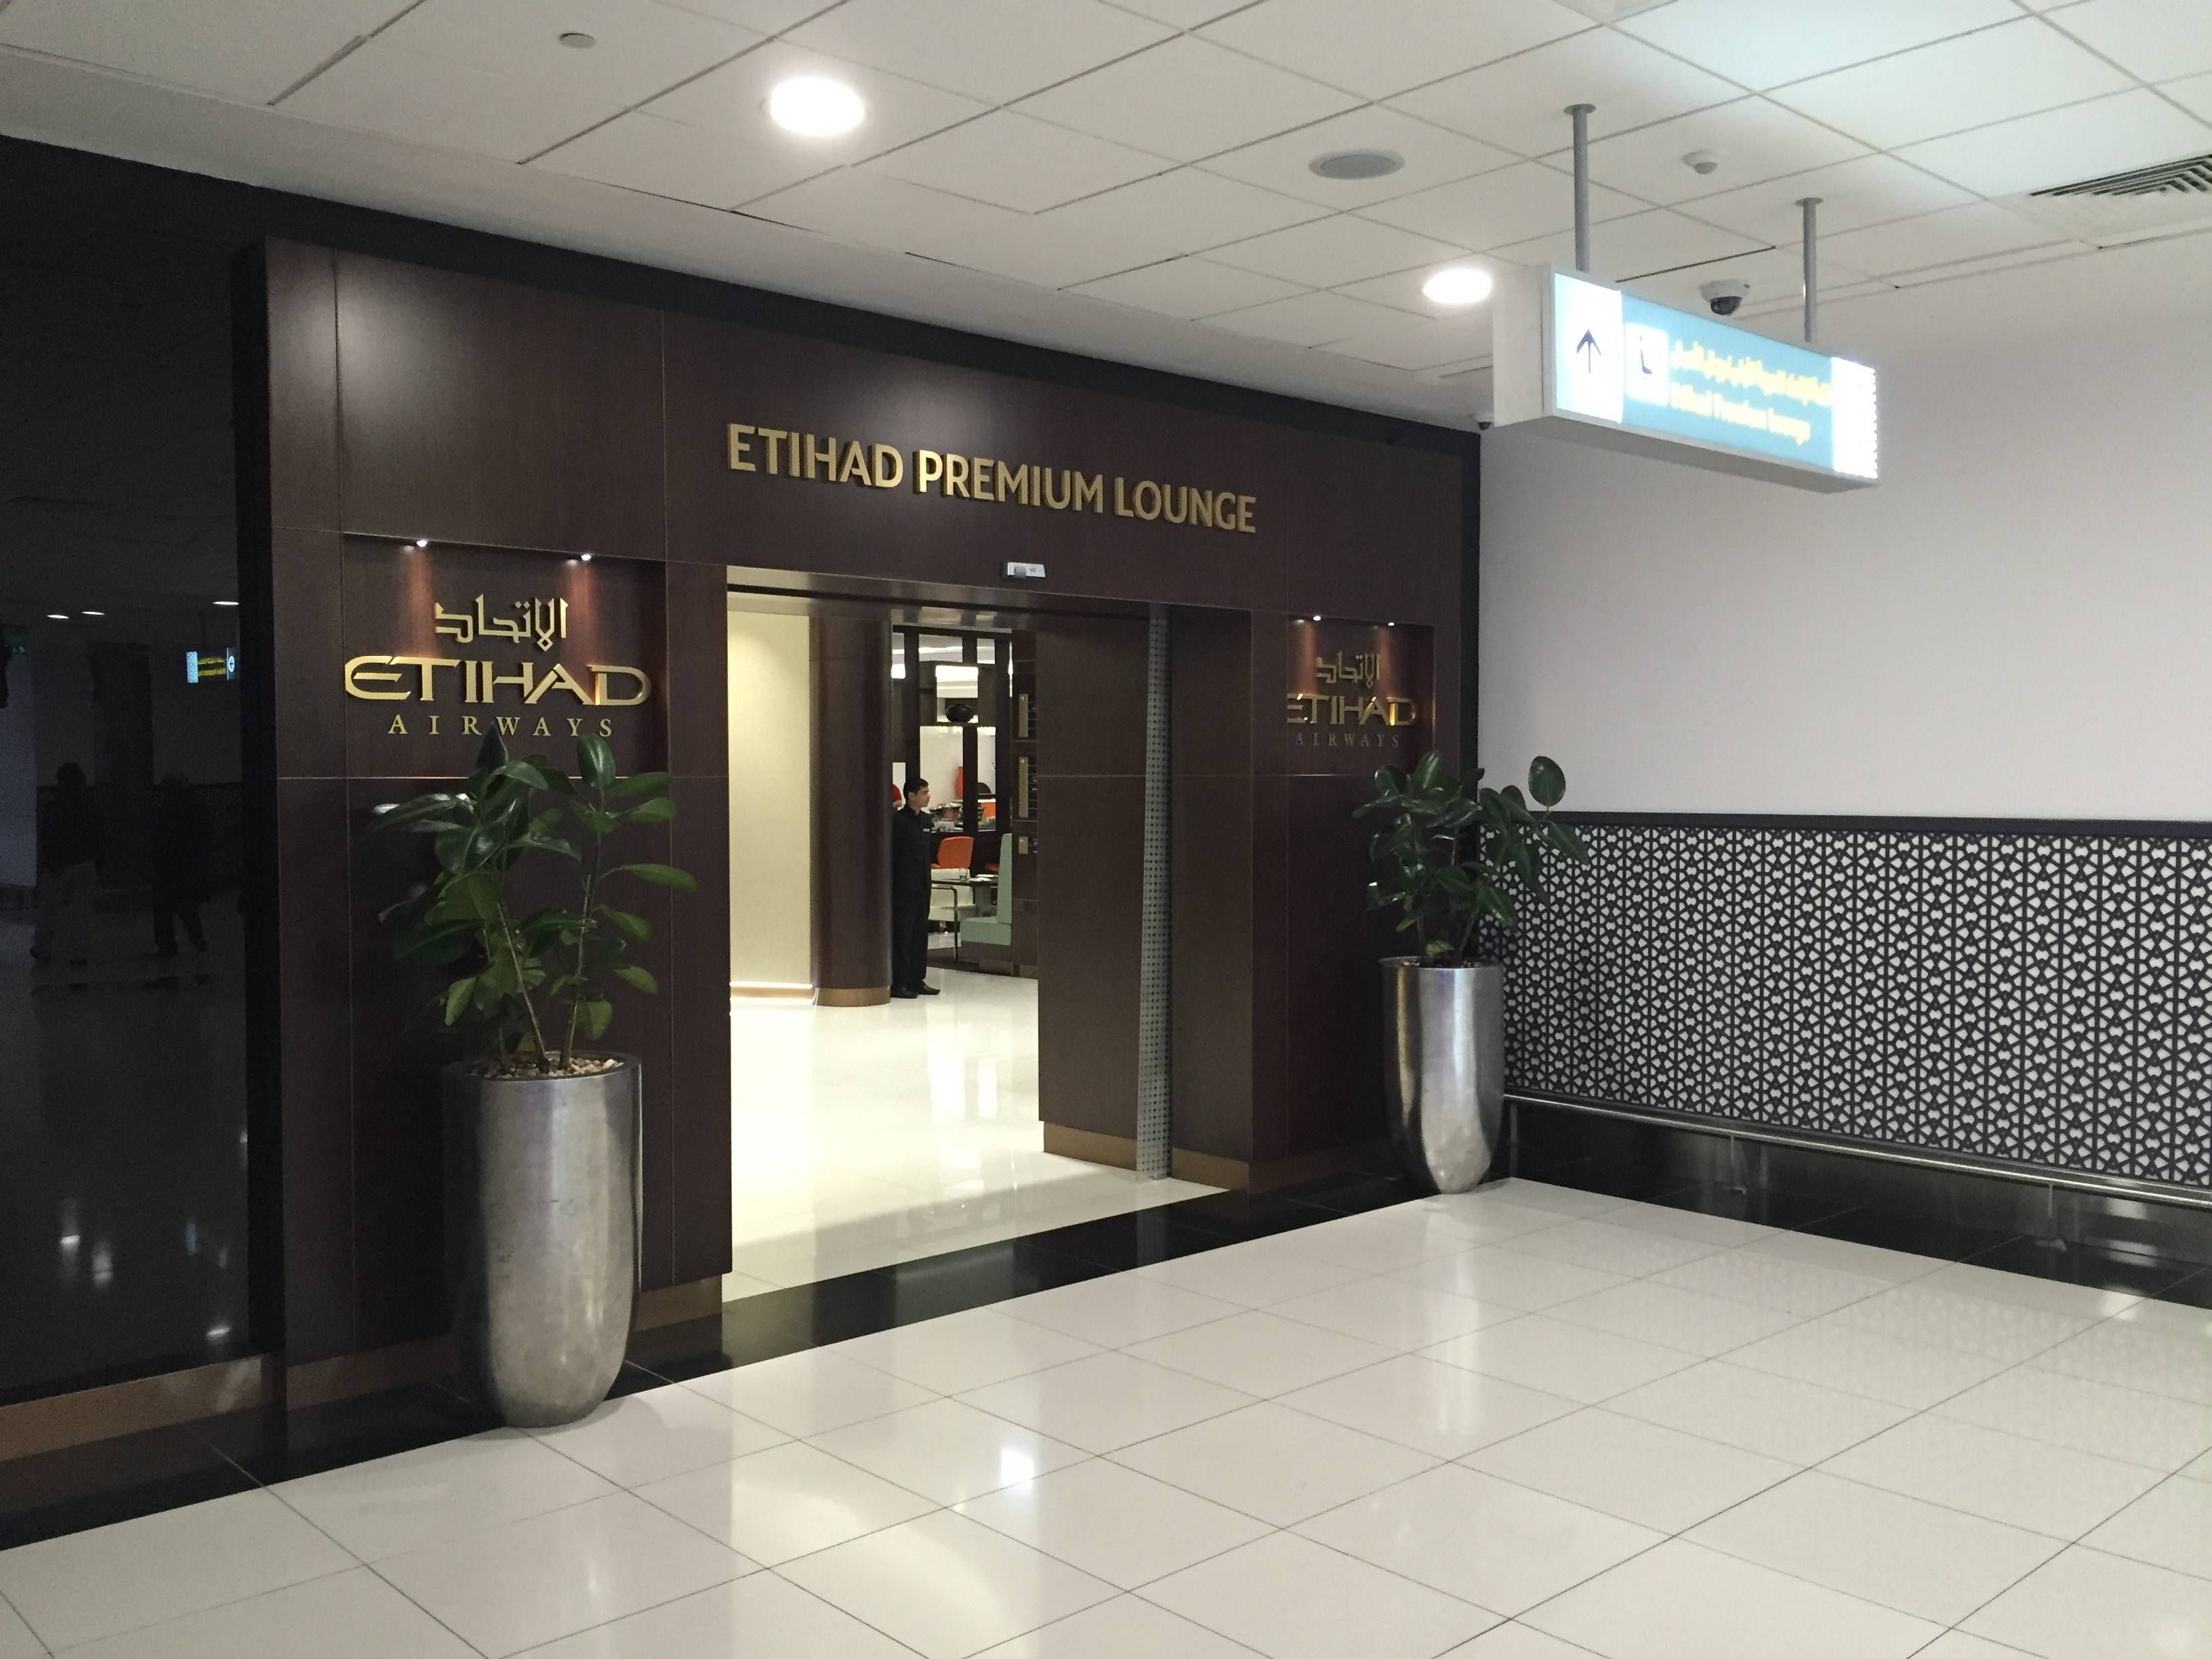 Etihad-Premium-Lounge-Abu-Dhabi-Passageiro-de-Primeira2